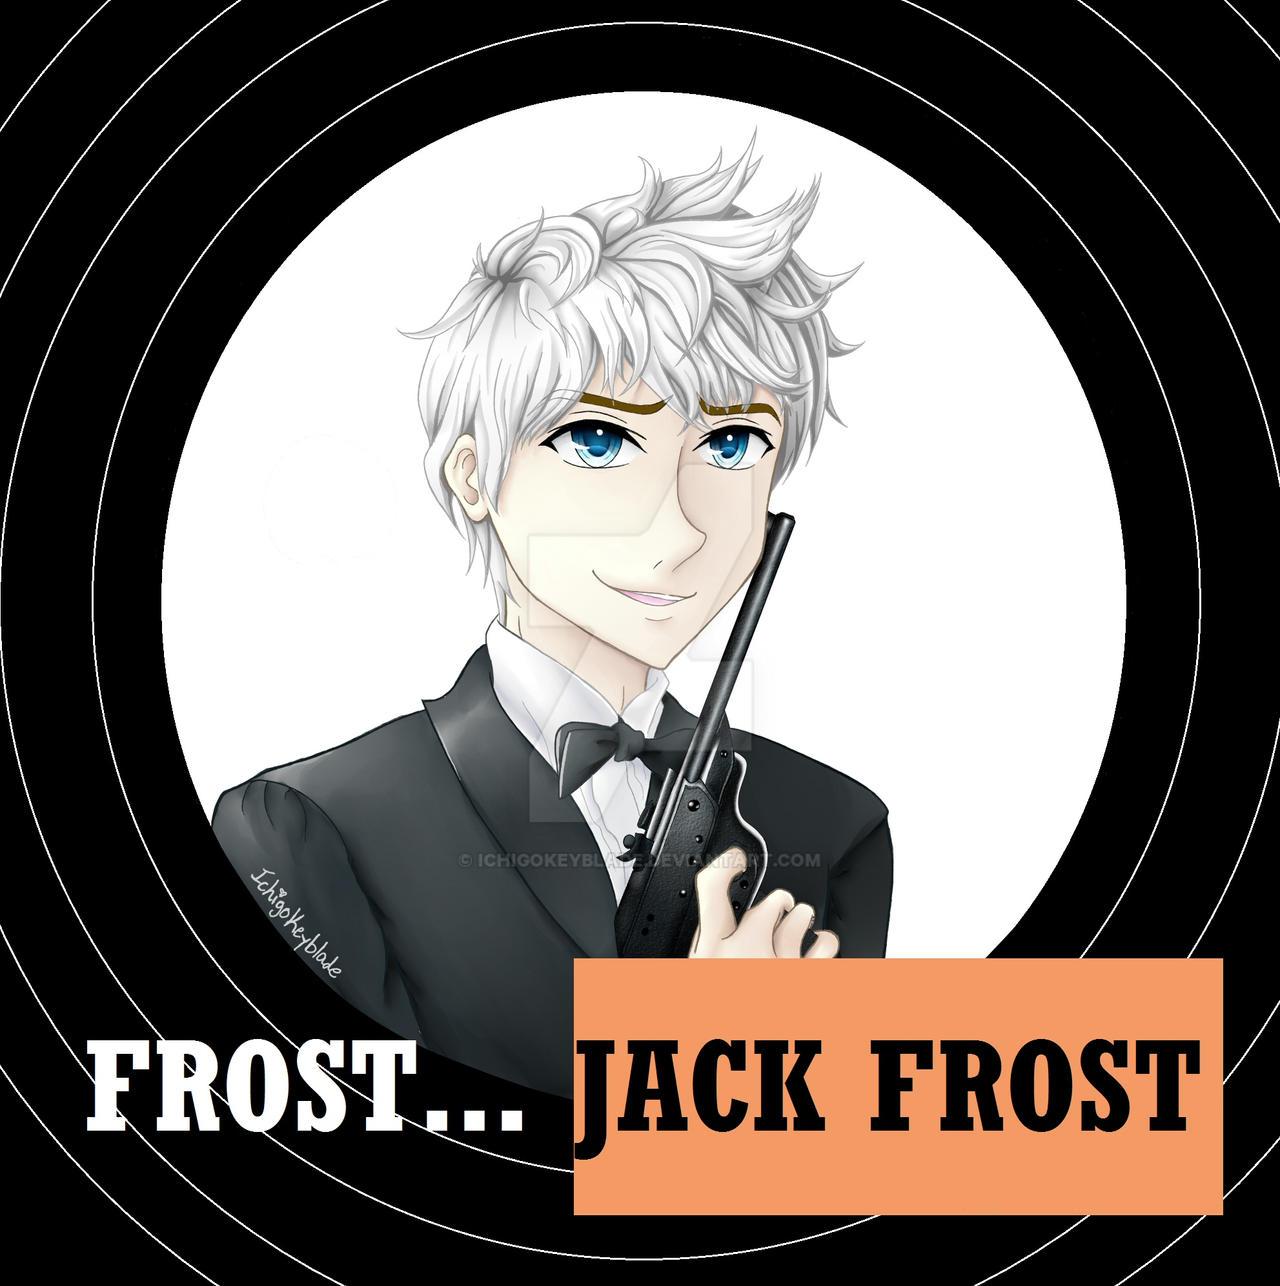 Frost... Jack Frost. by IchigoKeyblade